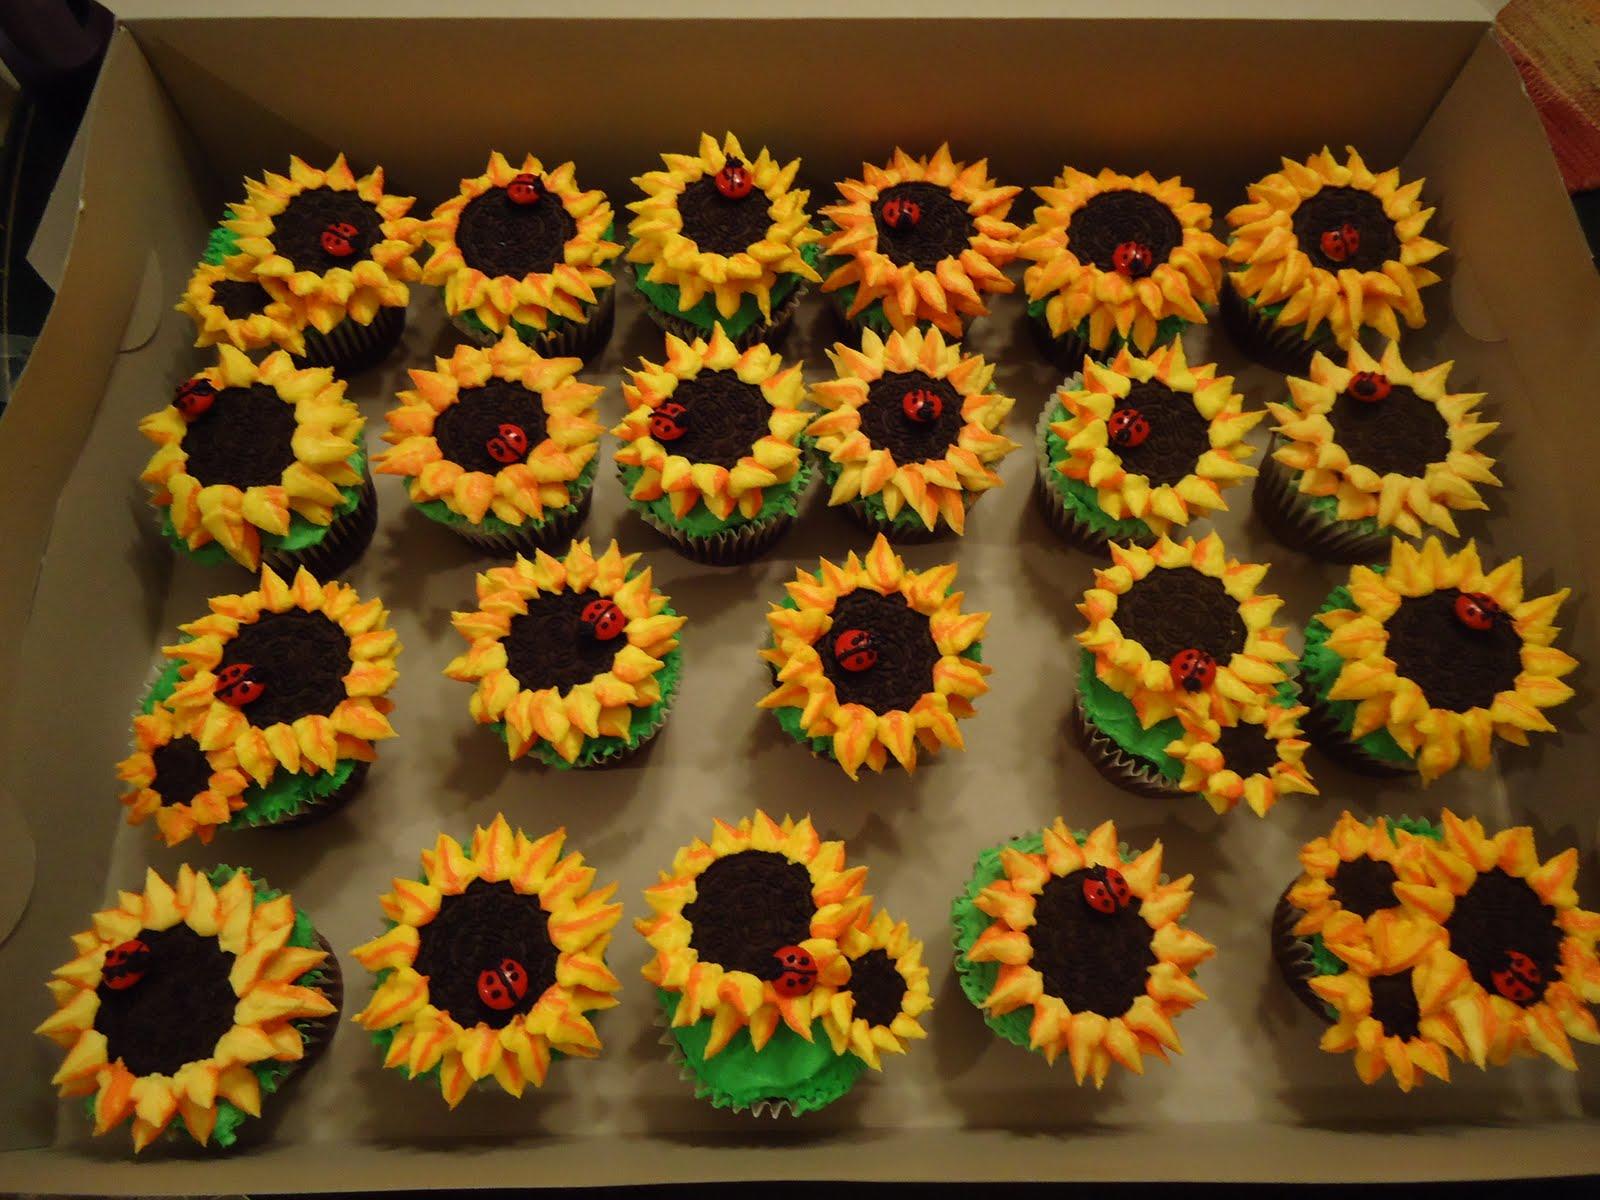 Cat S Cake Creations Sunflower Cupcakes